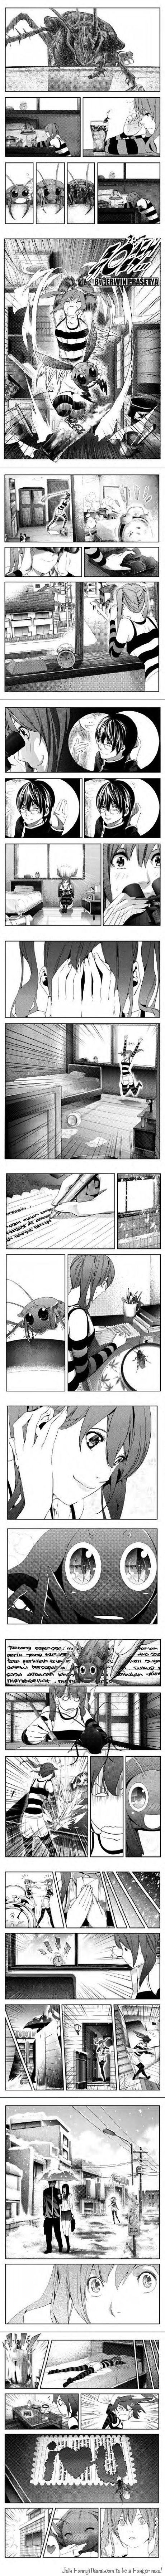 Silence Manga-Love Story